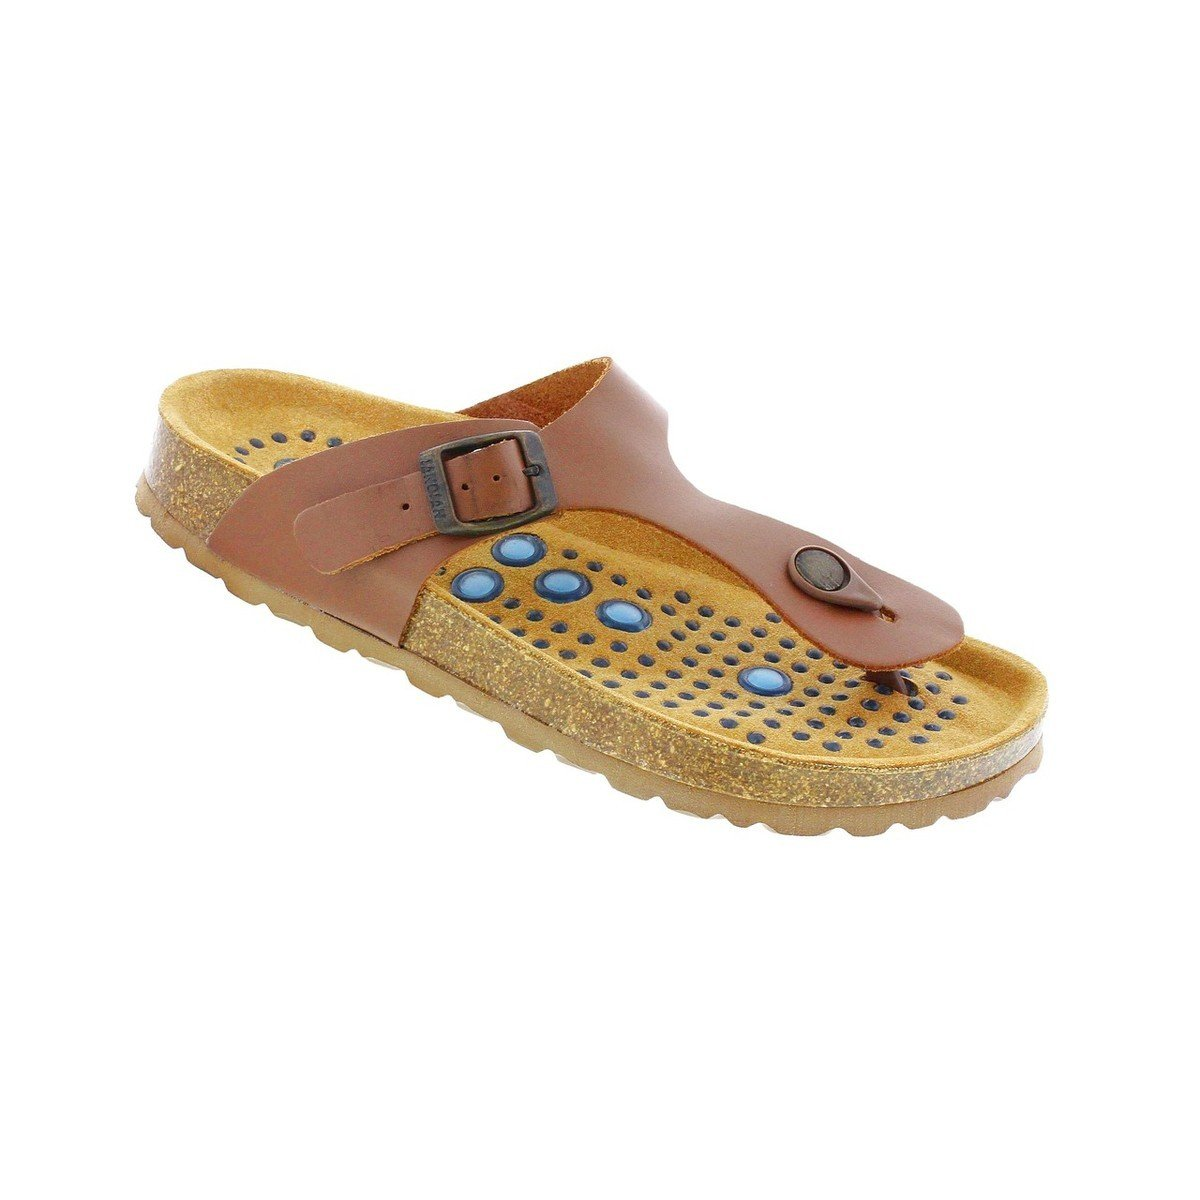 Sanosan Geneve Nappa Leather with Sietelunas Technology - Brown - 38 M EU / 7-7.5 B(M) US